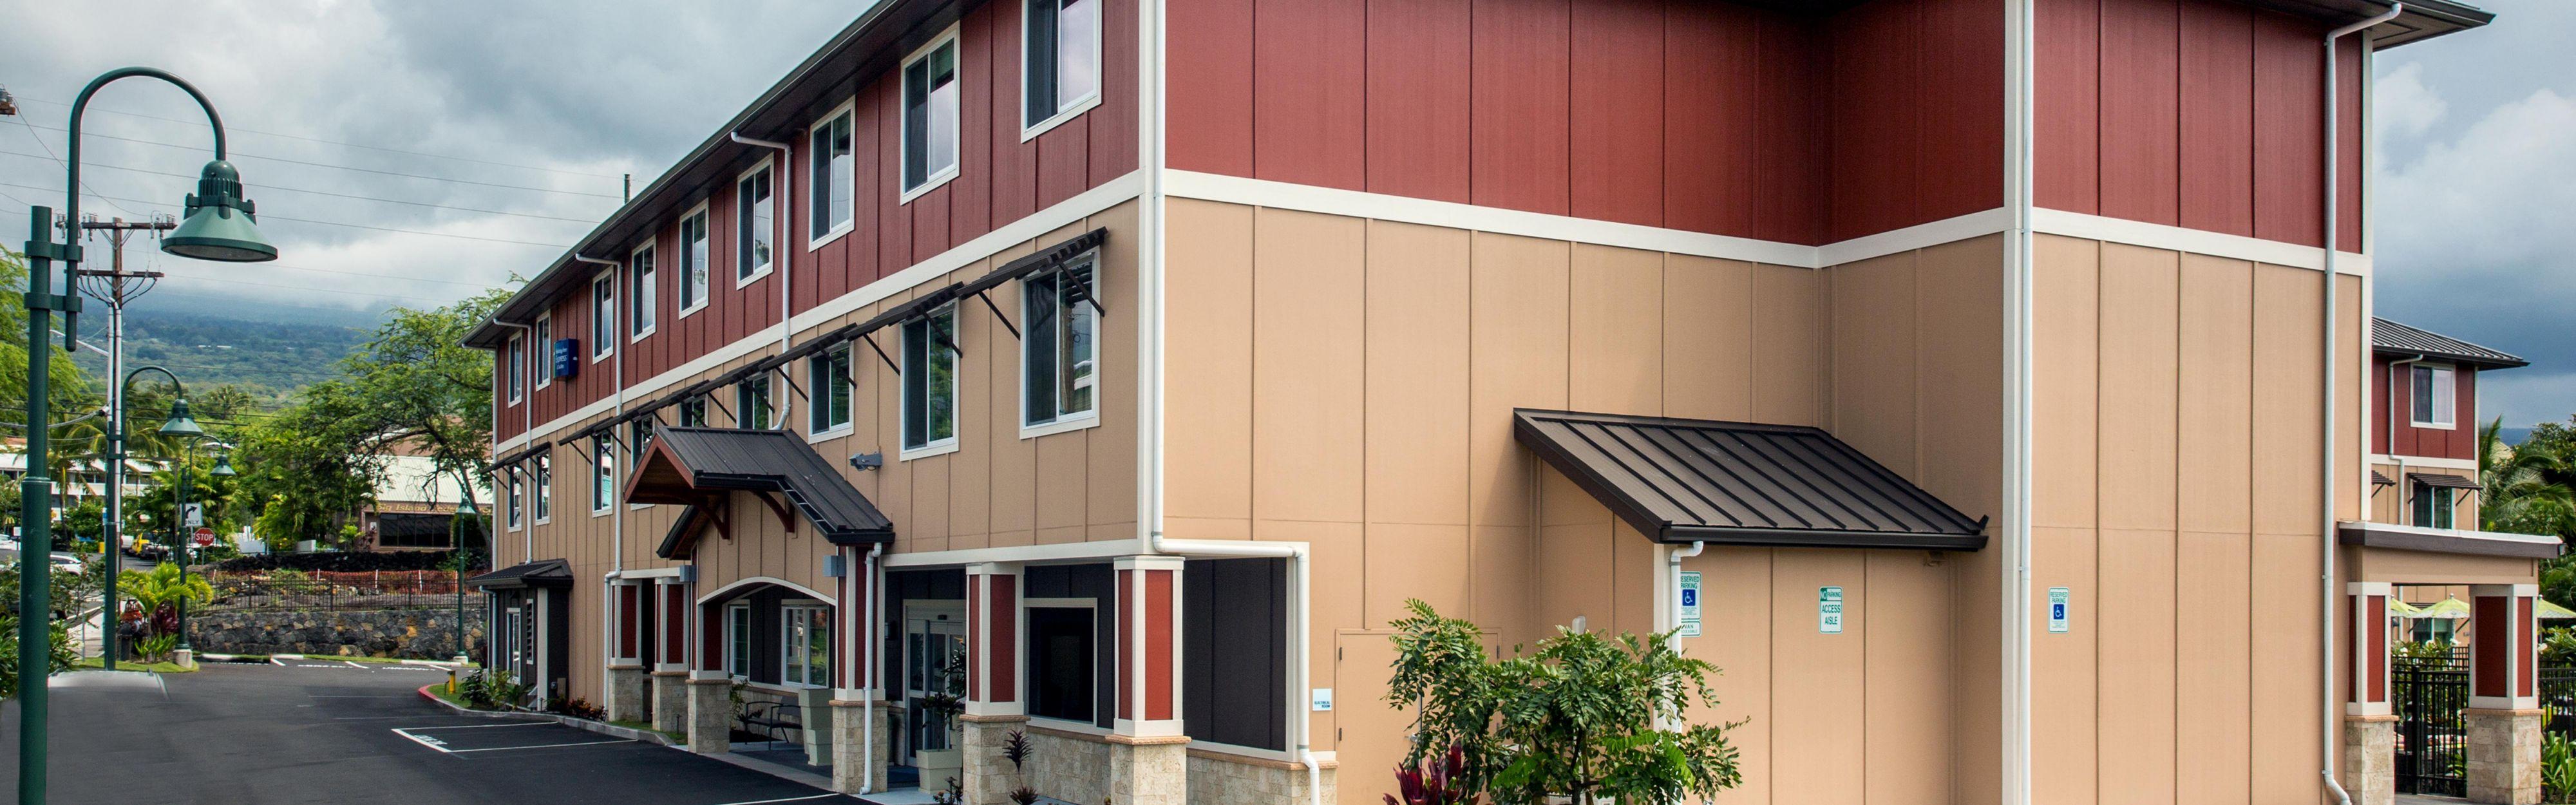 Holiday Inn Express & Suites Kailua-Kona image 0